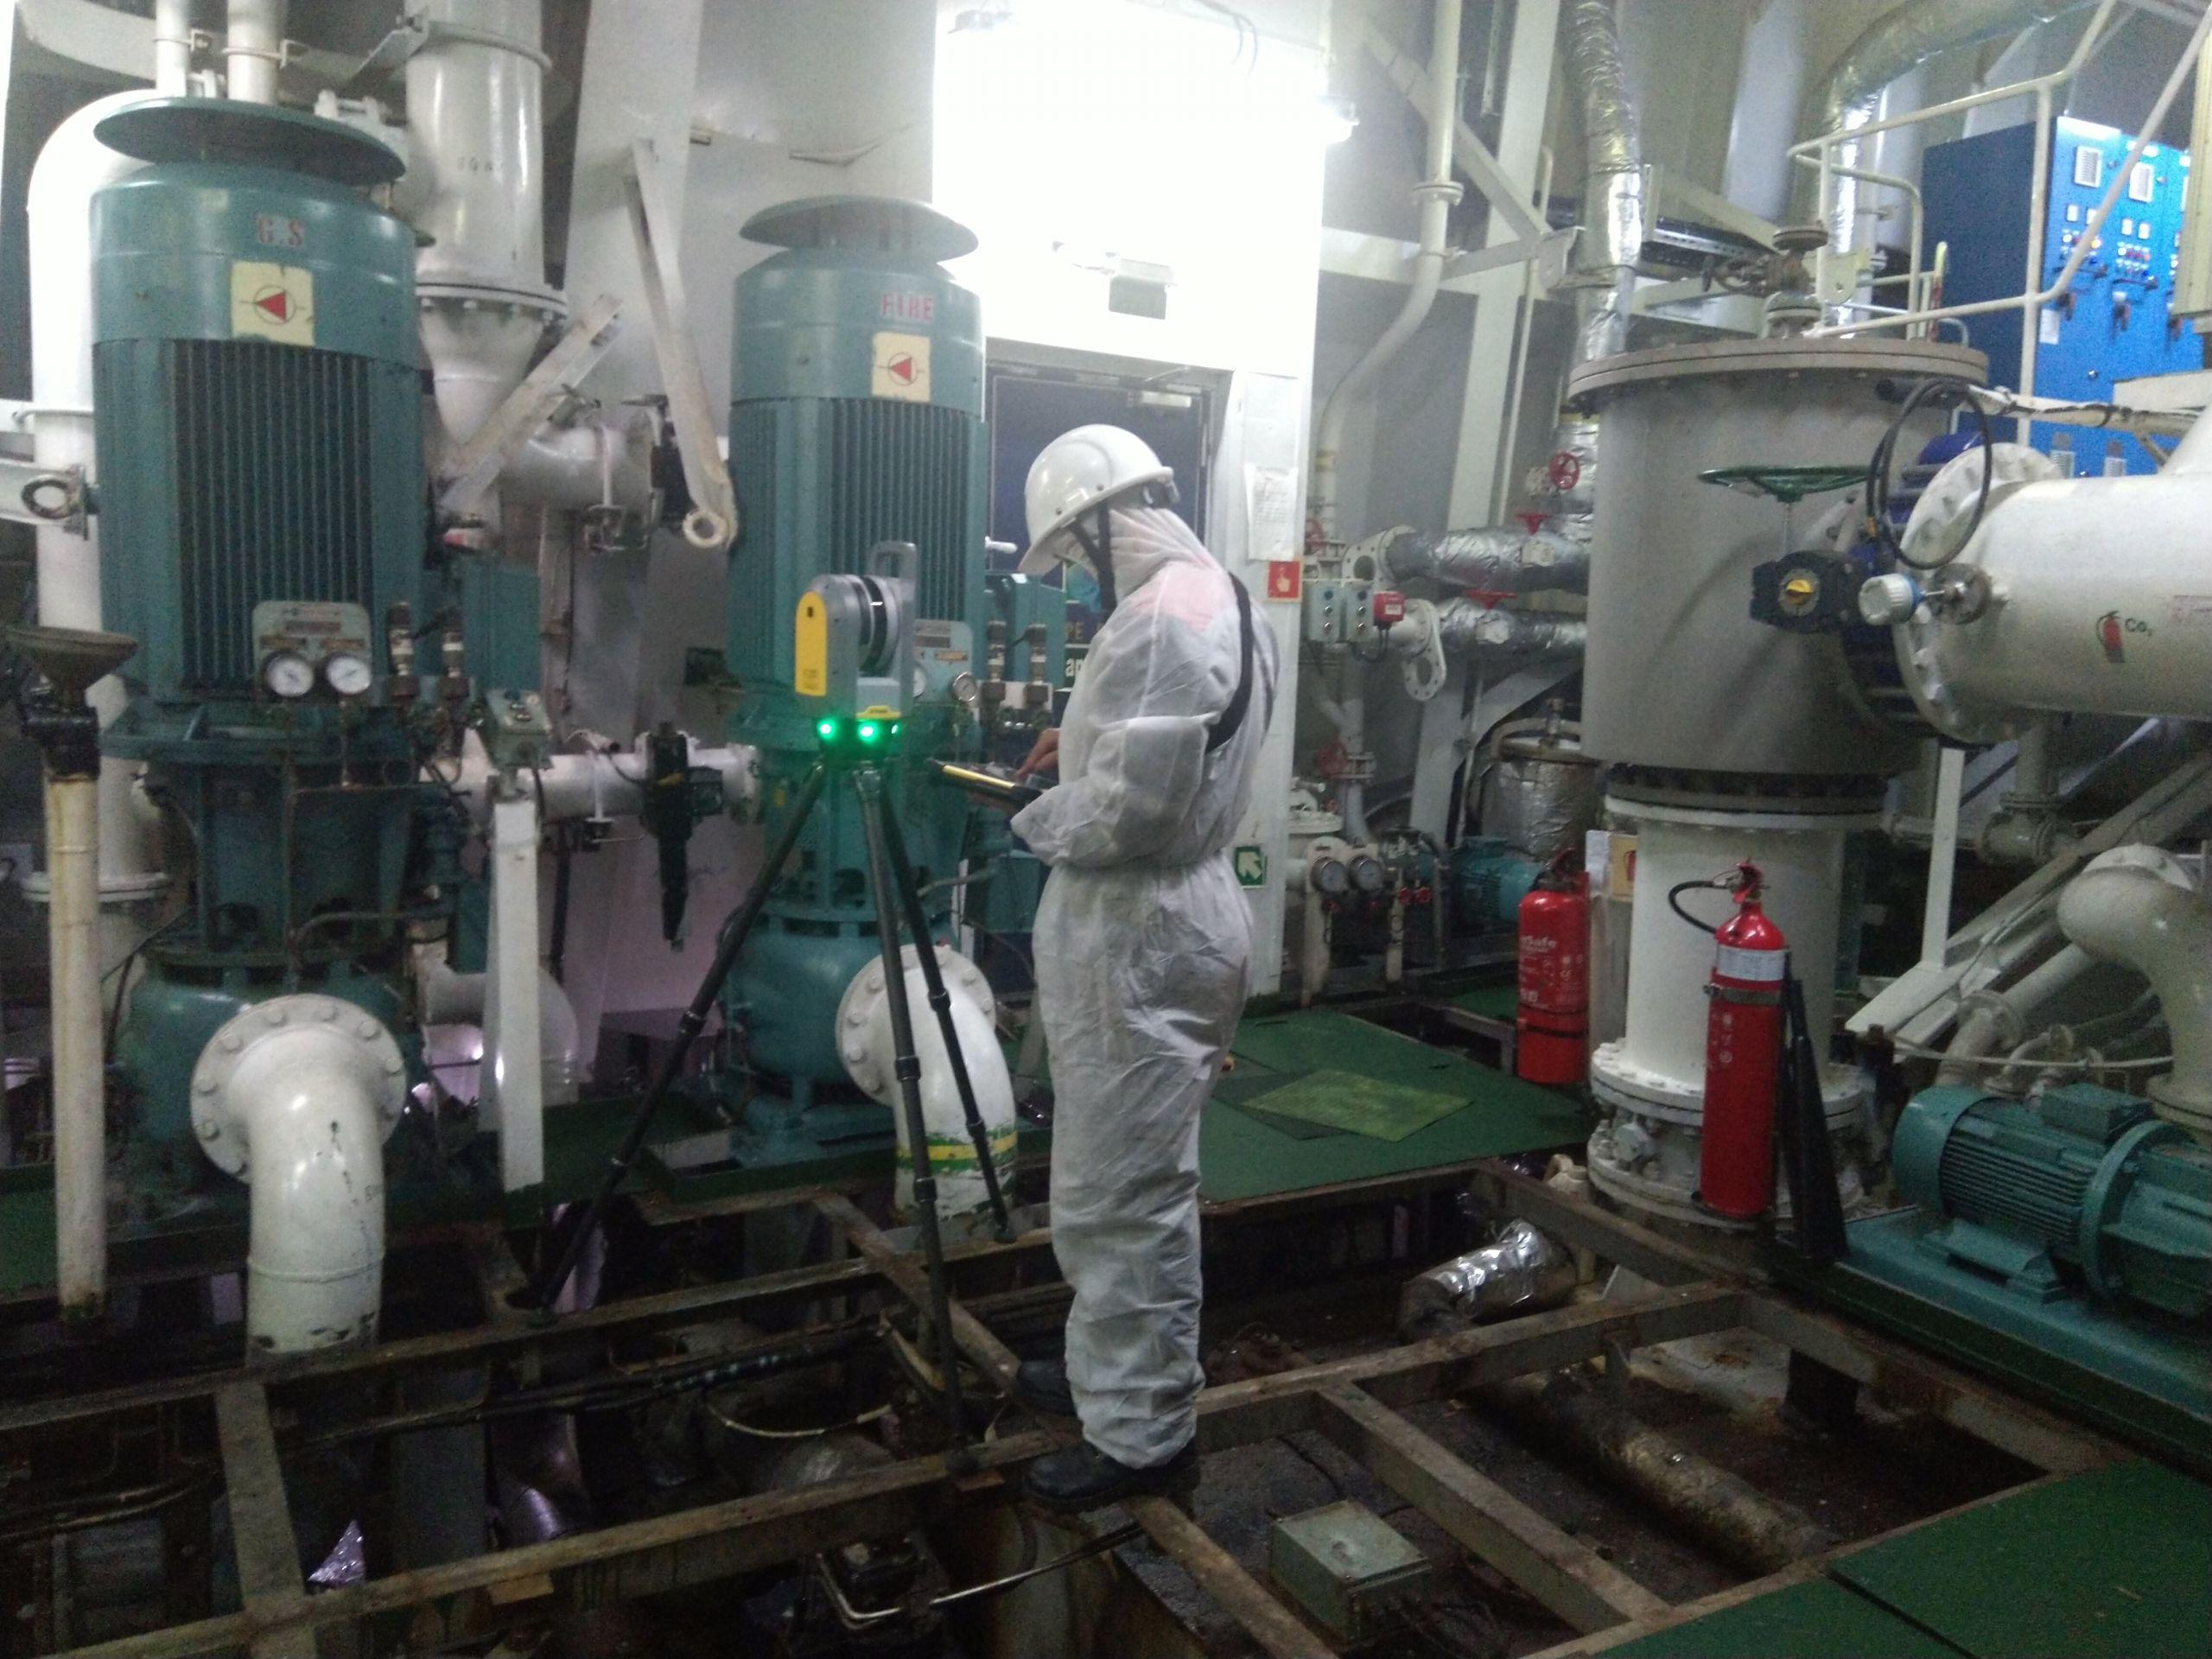 Utilizes 3D Laser Scanning during COVID 19